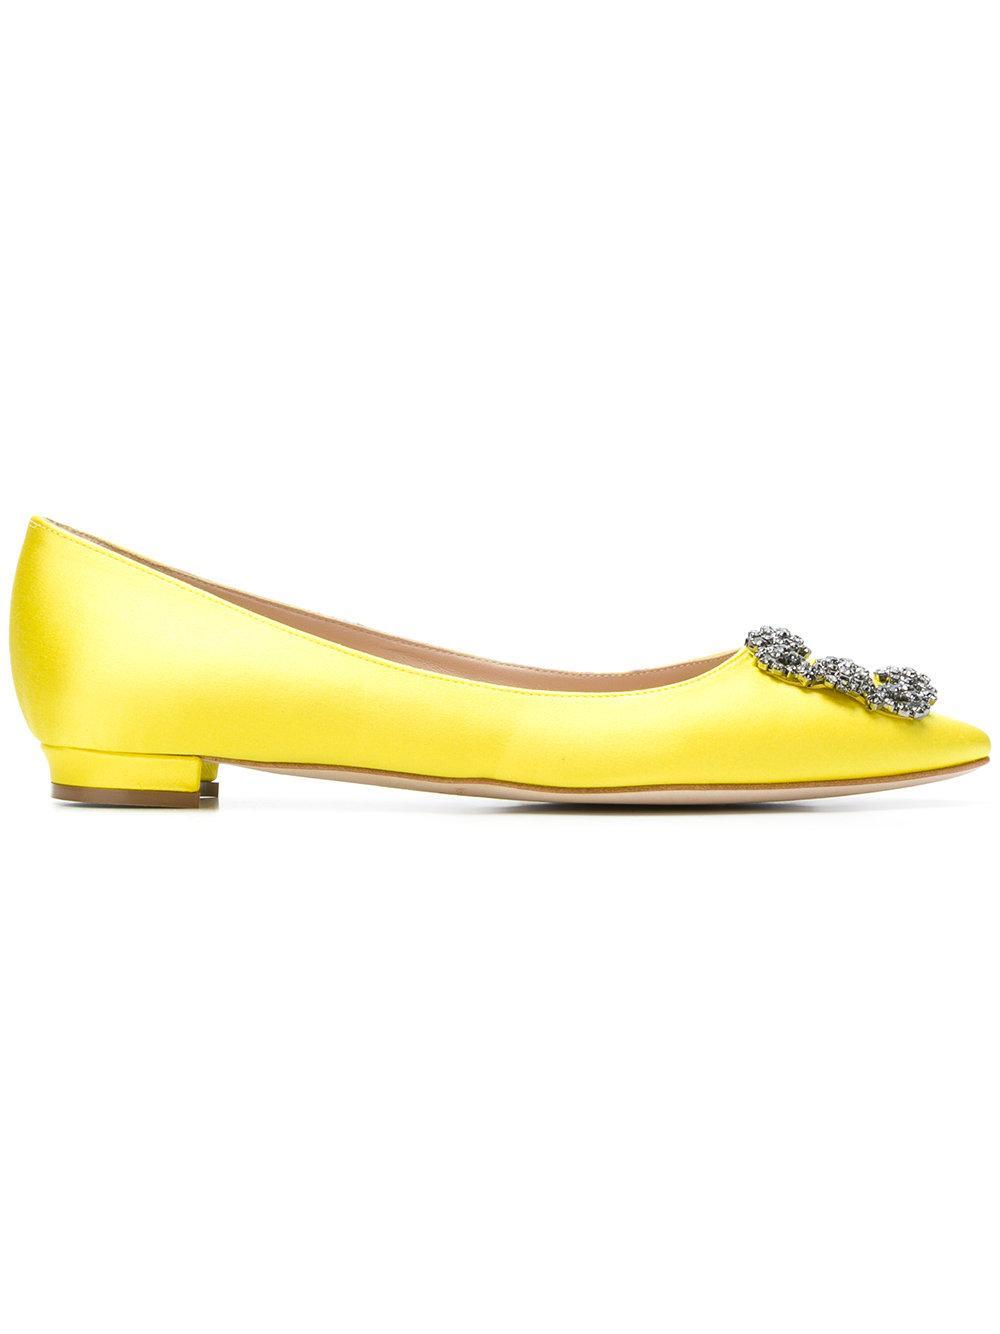 Manolo Blahnik Hangisi Crystal-Buckle Satin Flats In Yellow